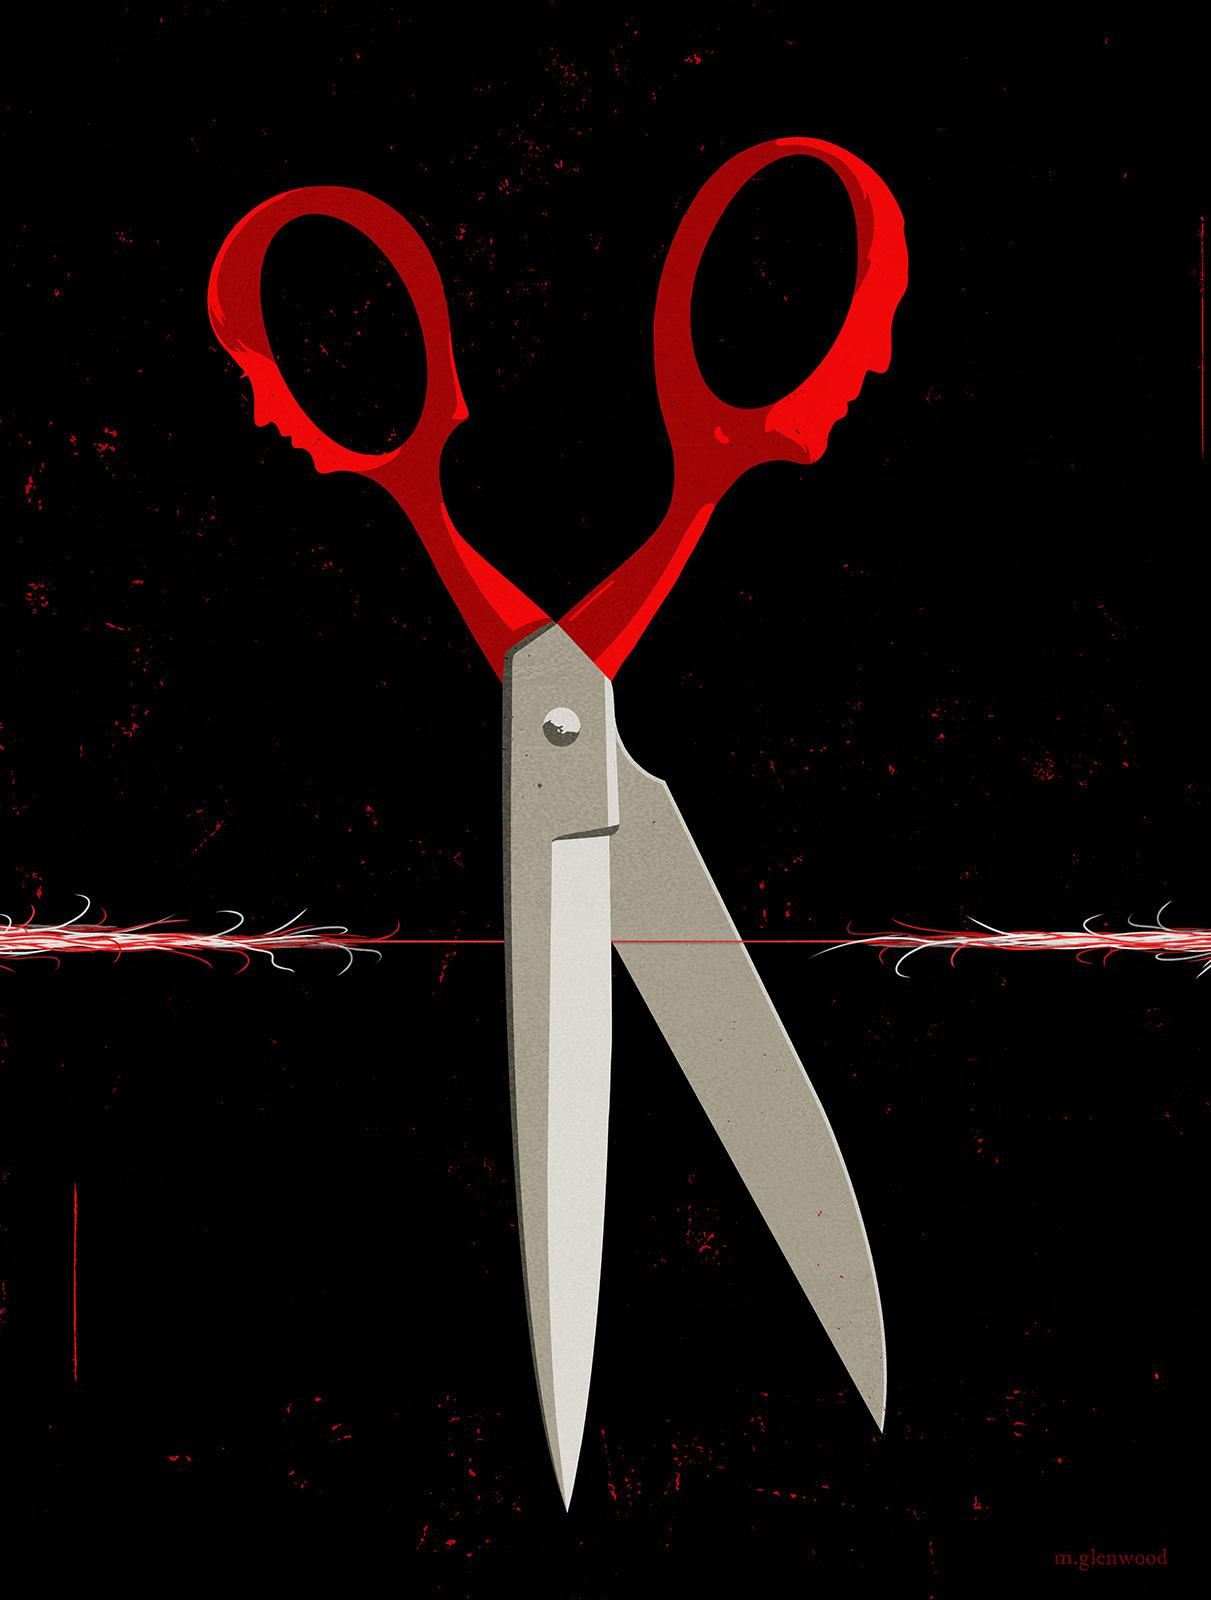 Michael Glenwood / Cutting Ties